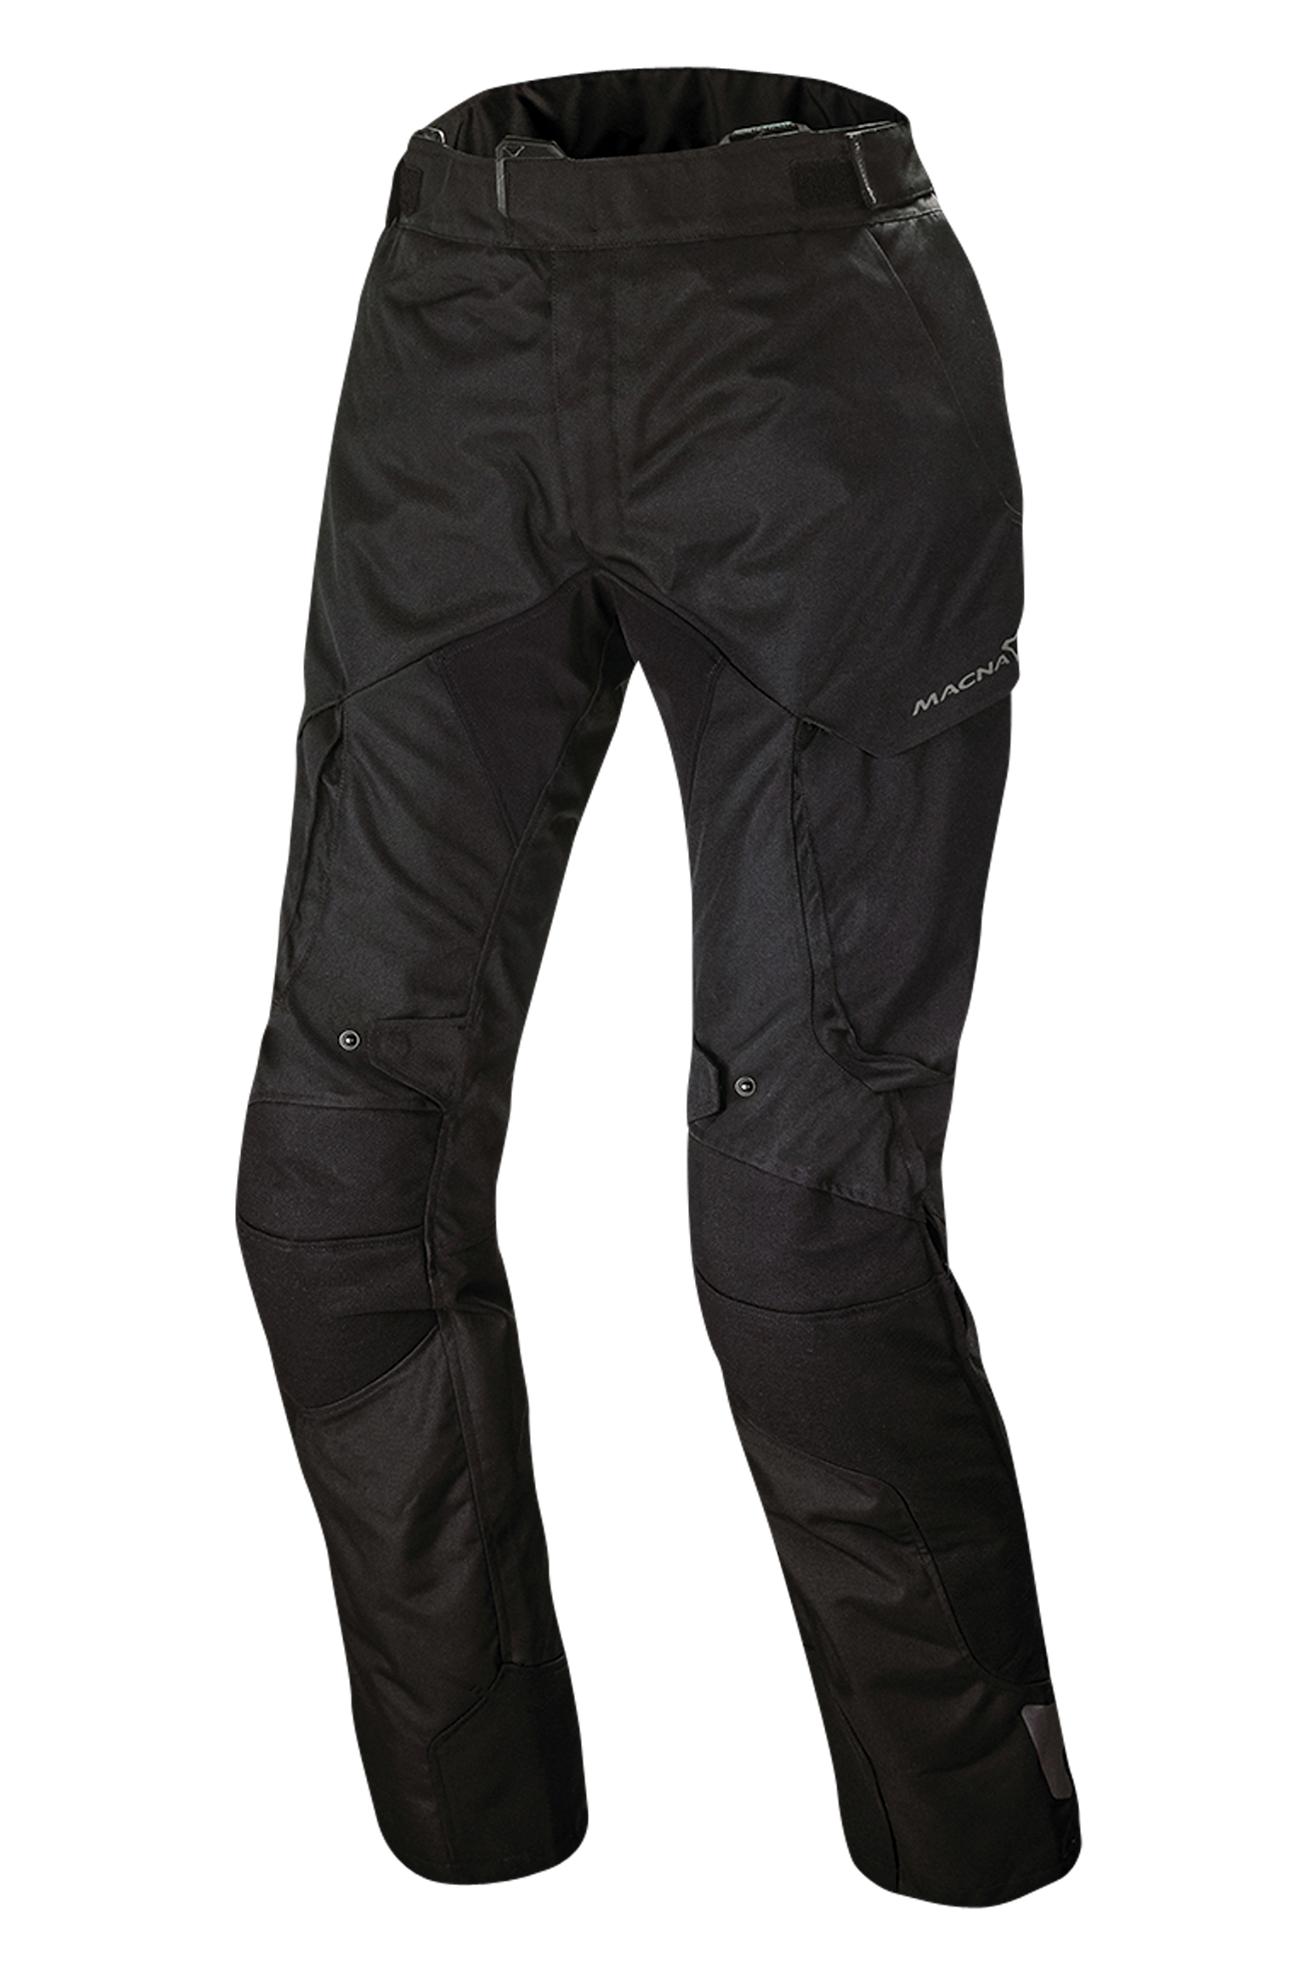 Macna Pantaloni Moto Donna  Forge Neri